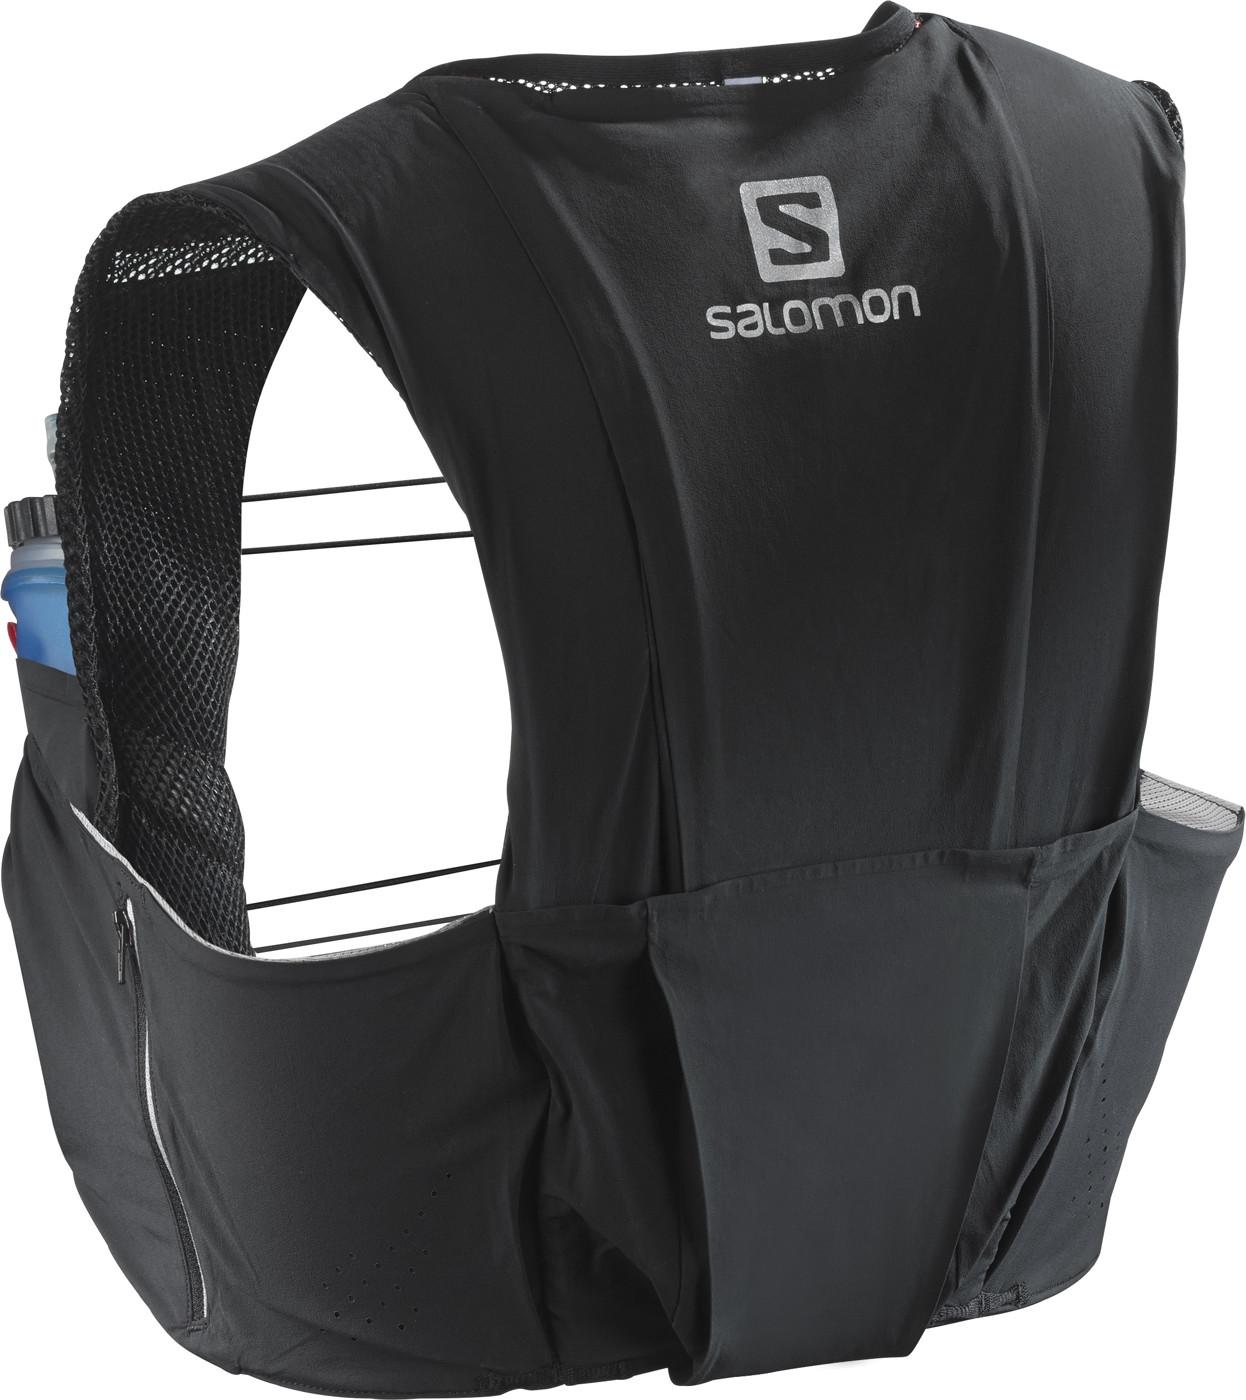 SALOMON BAG S-LAB SENSE ULTRA 8 SET Black/RD